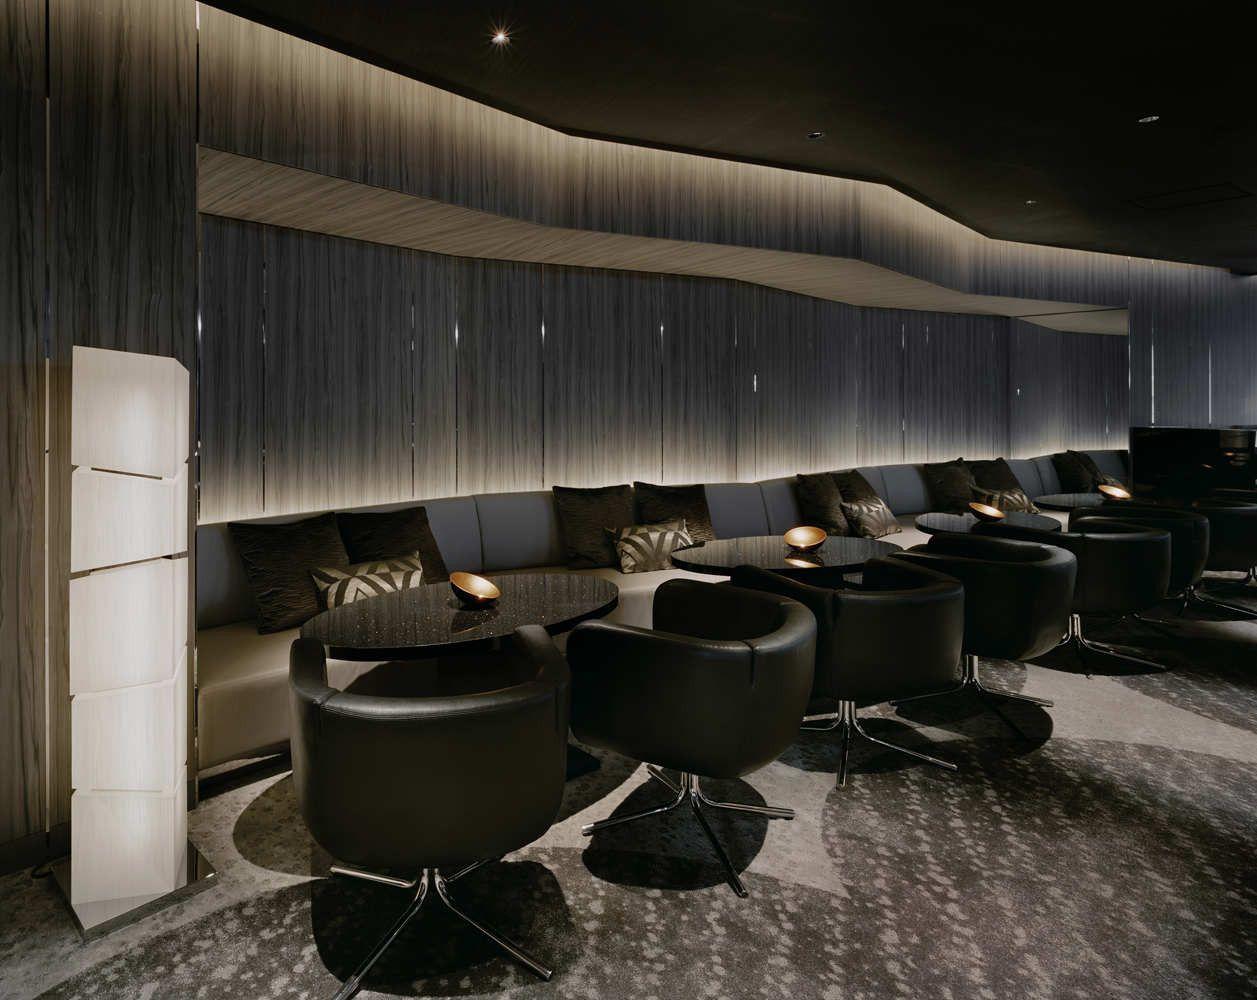 Gallery Of Mixx Bar Lounge Curiosity 10 Bar Lounge Design Lounge Interiors Lounge Design